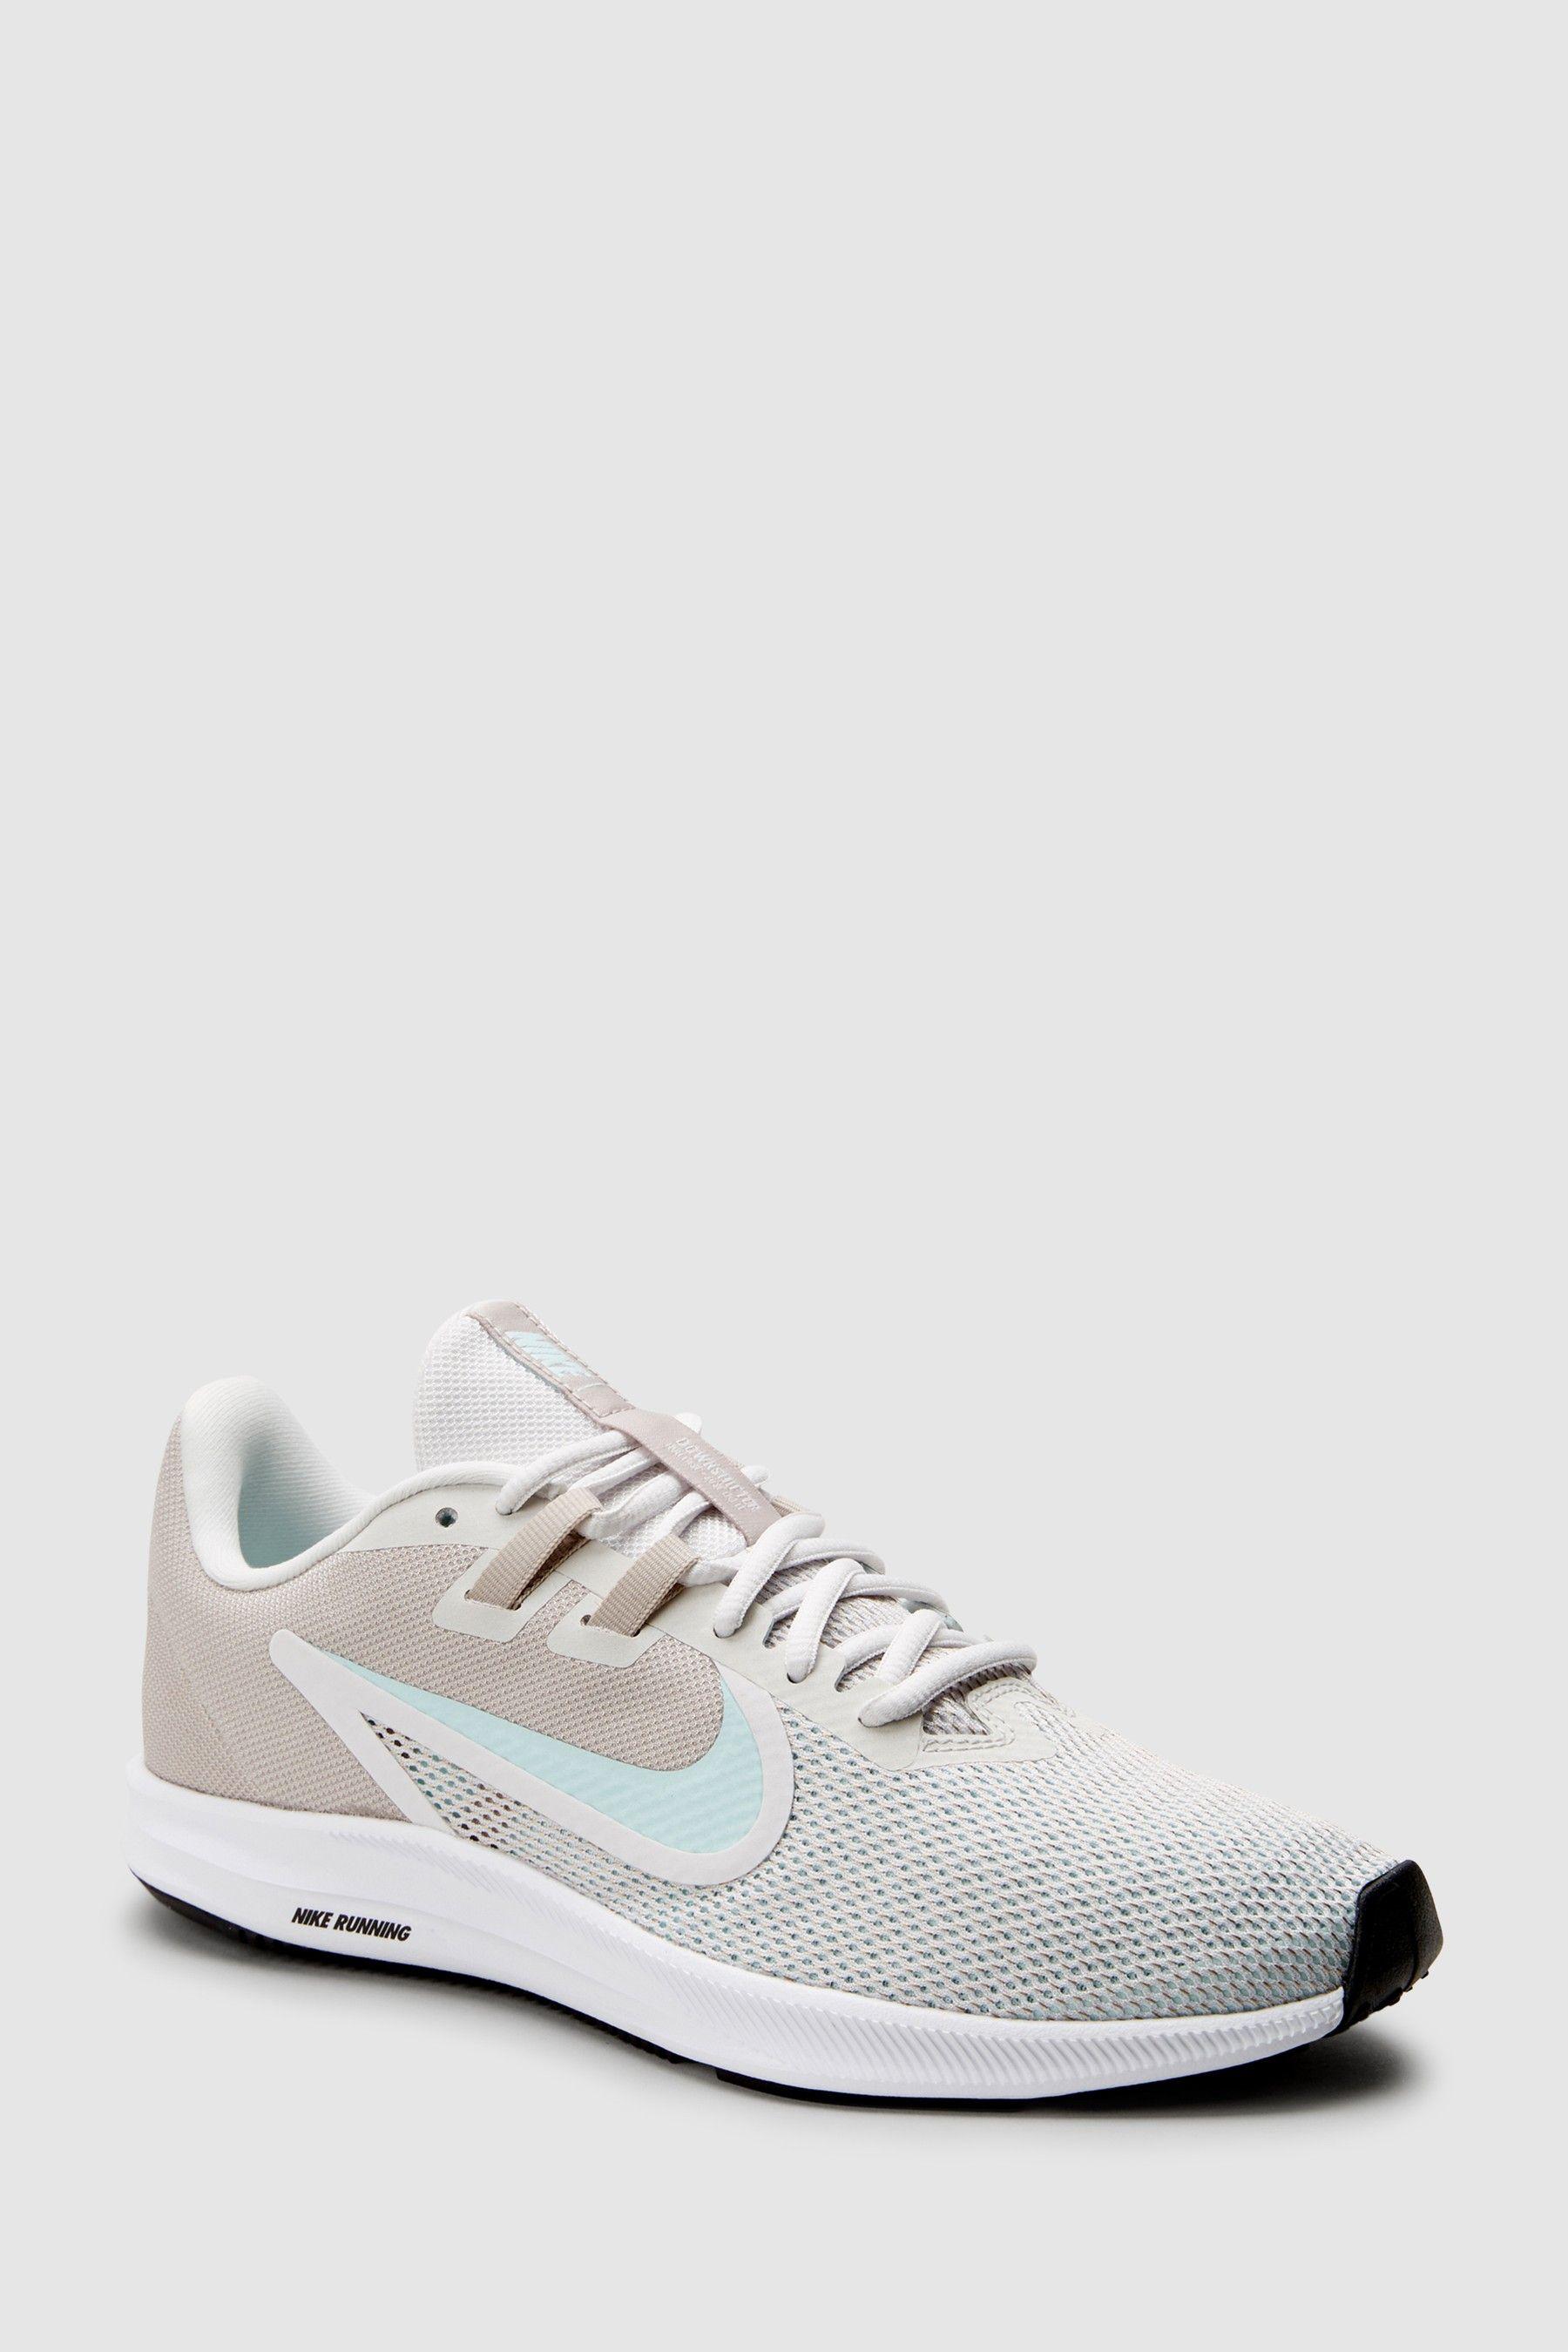 Nike Run Downshifter 9 Trainers | Nike, Fleet feet, Training